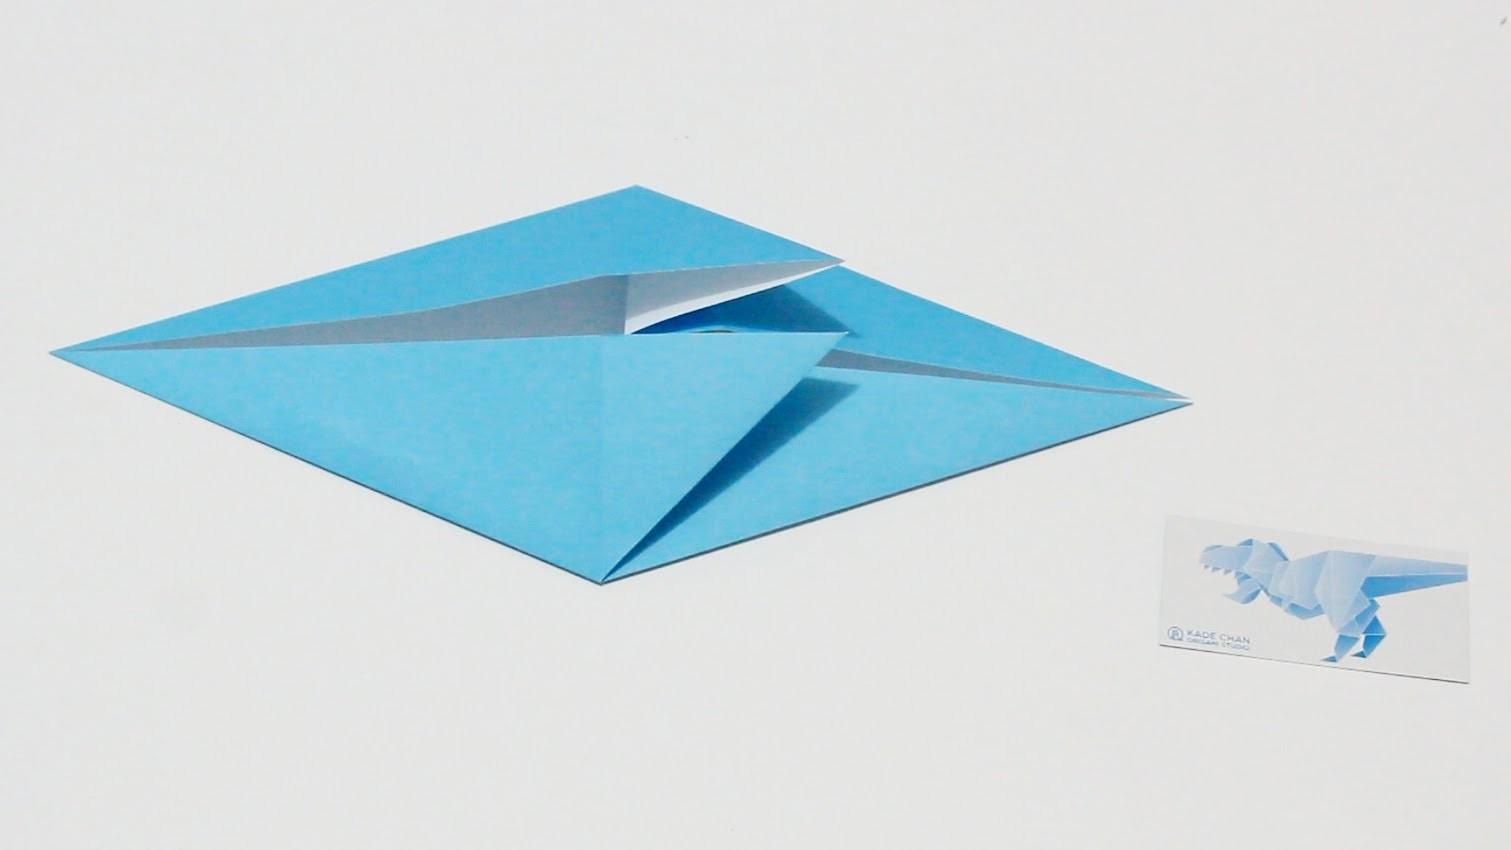 Origami Basics 13 : How to fold Fish Base 摺紙基本技巧 13 : 魚基本形